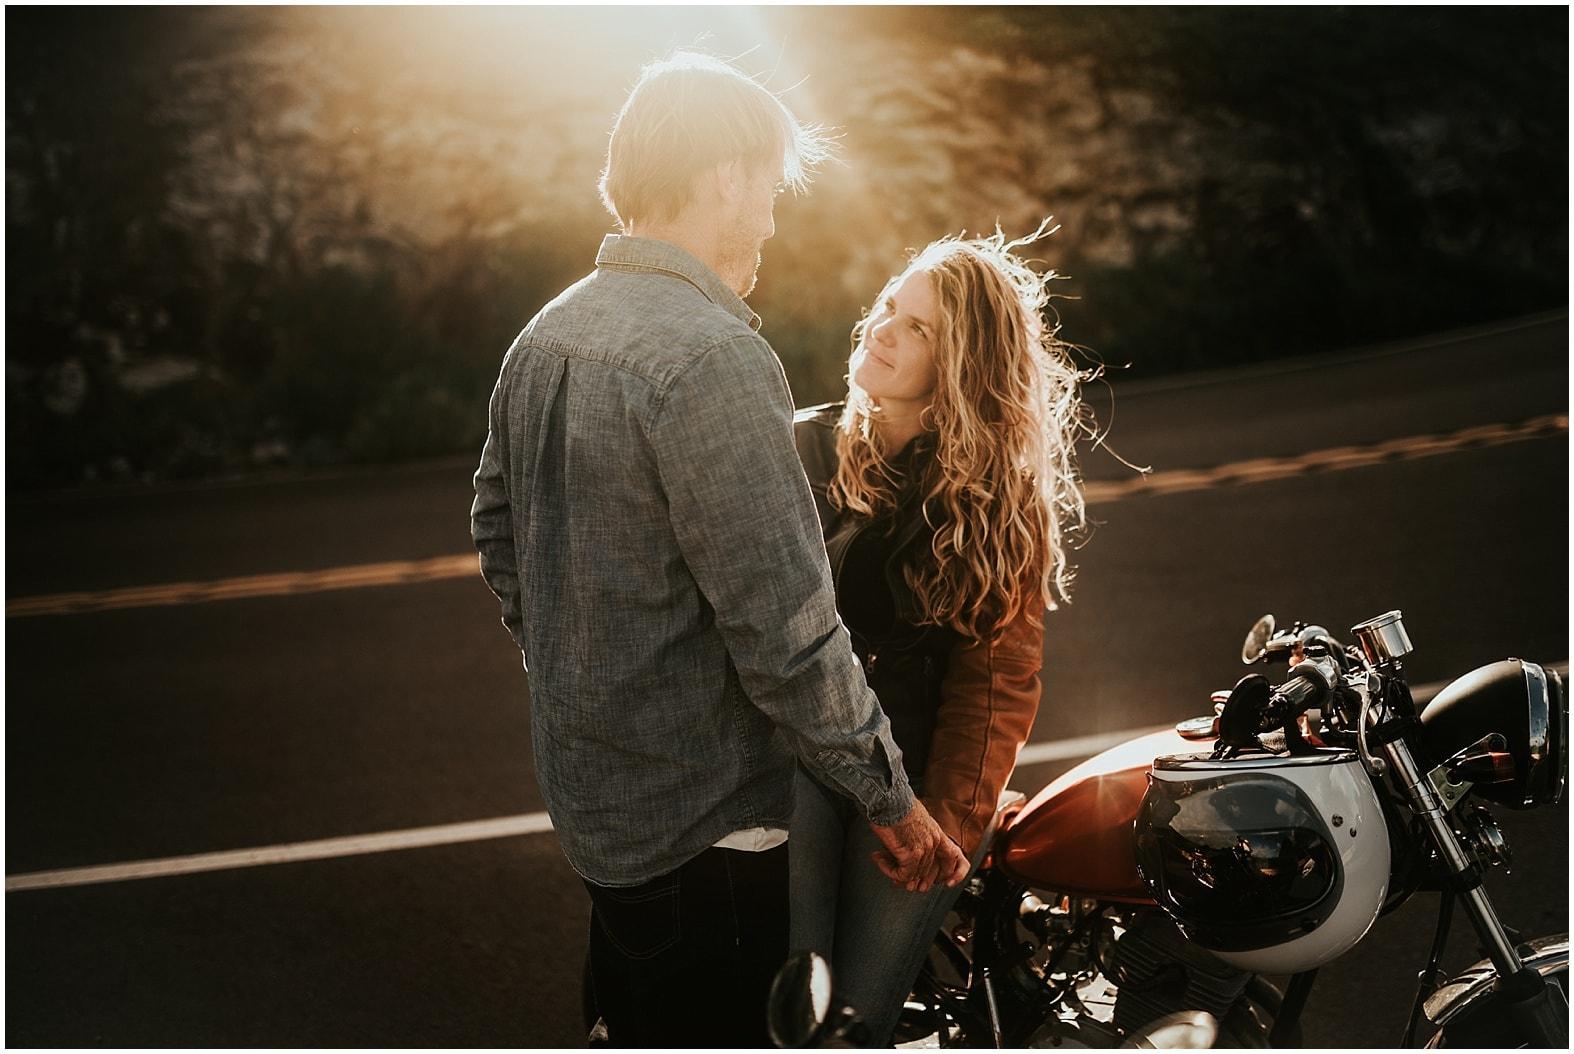 Motorcycle maui17